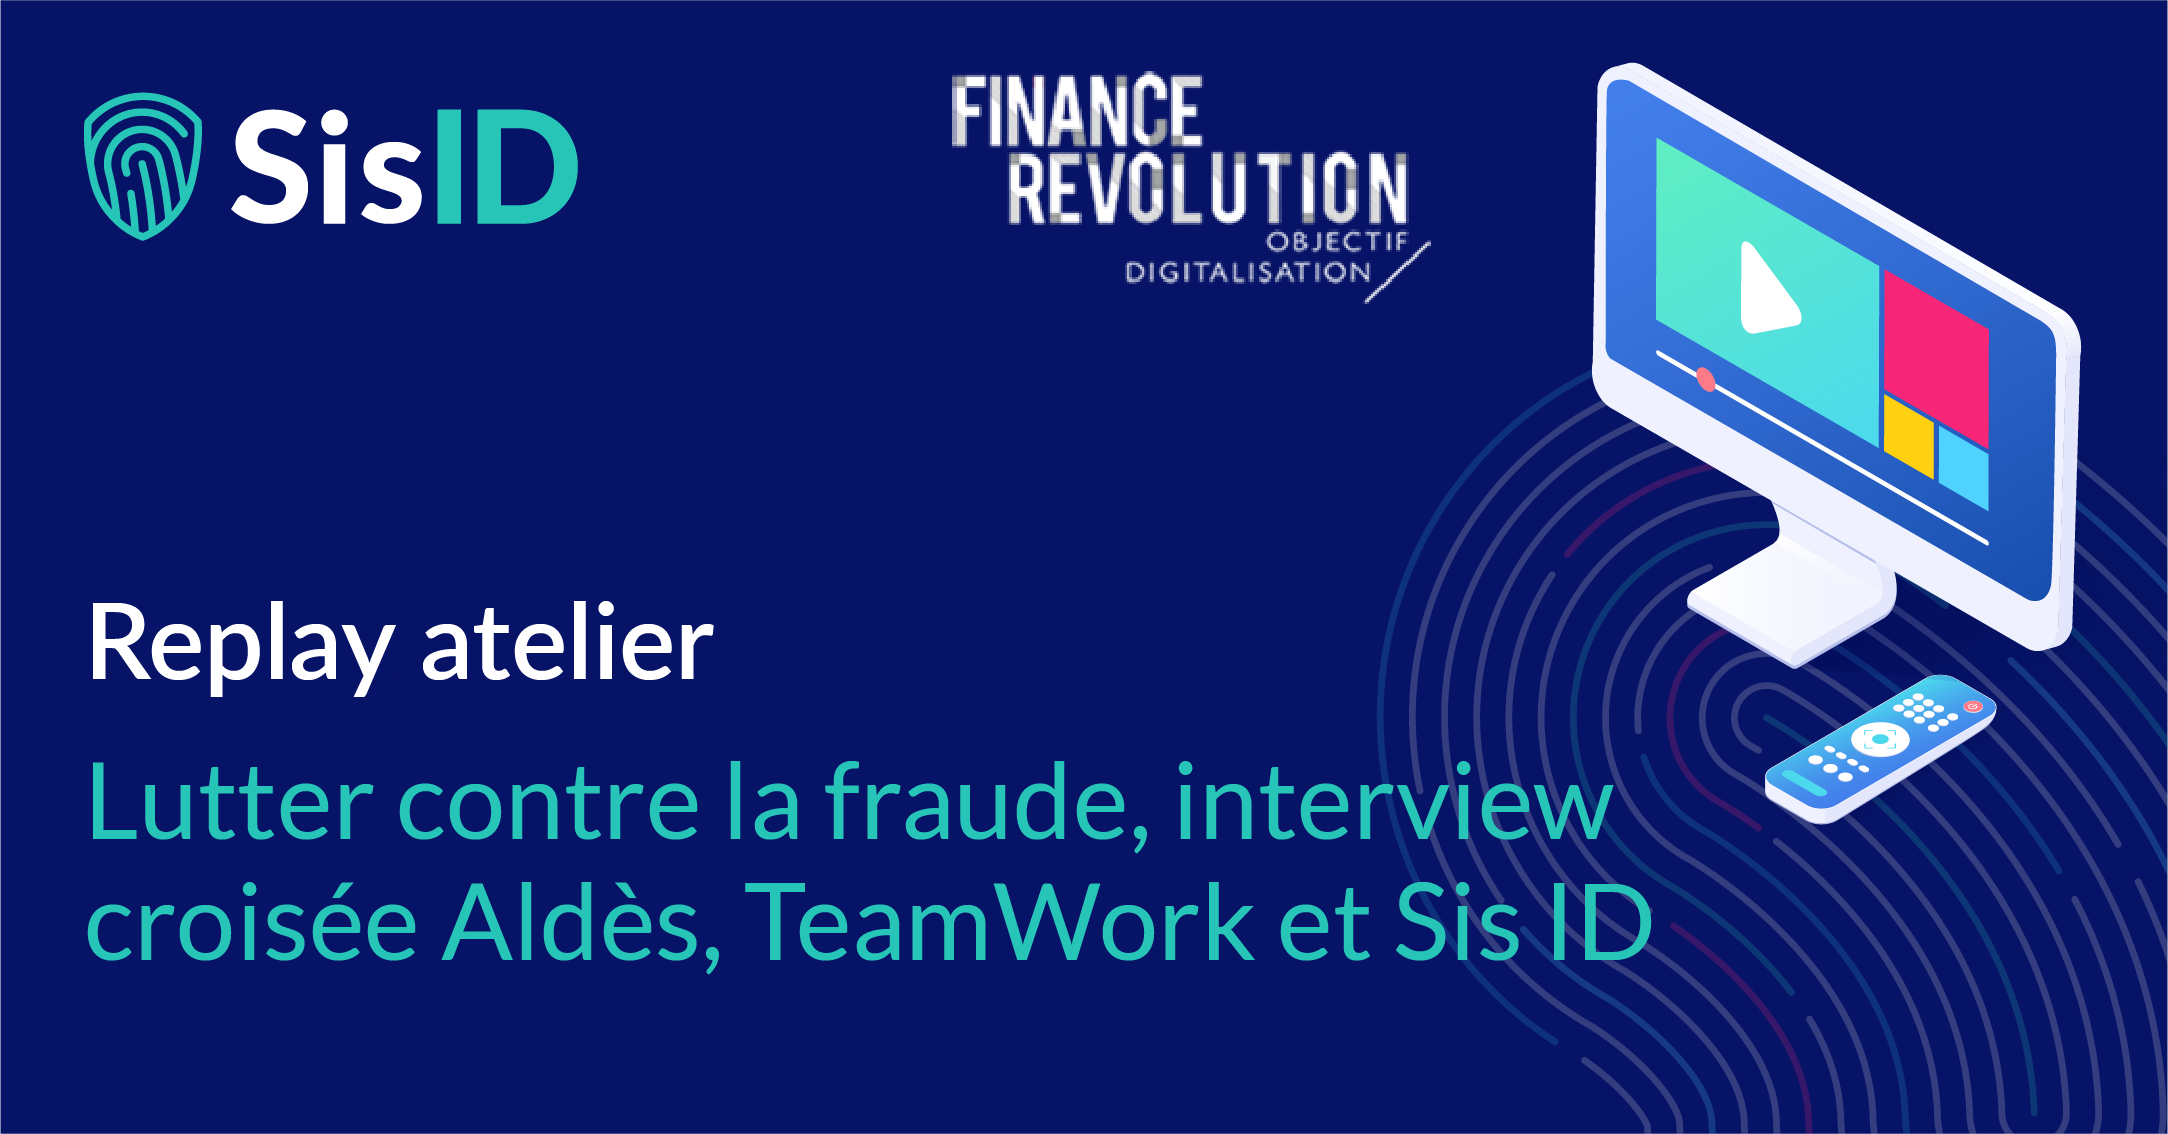 Finance Revolution